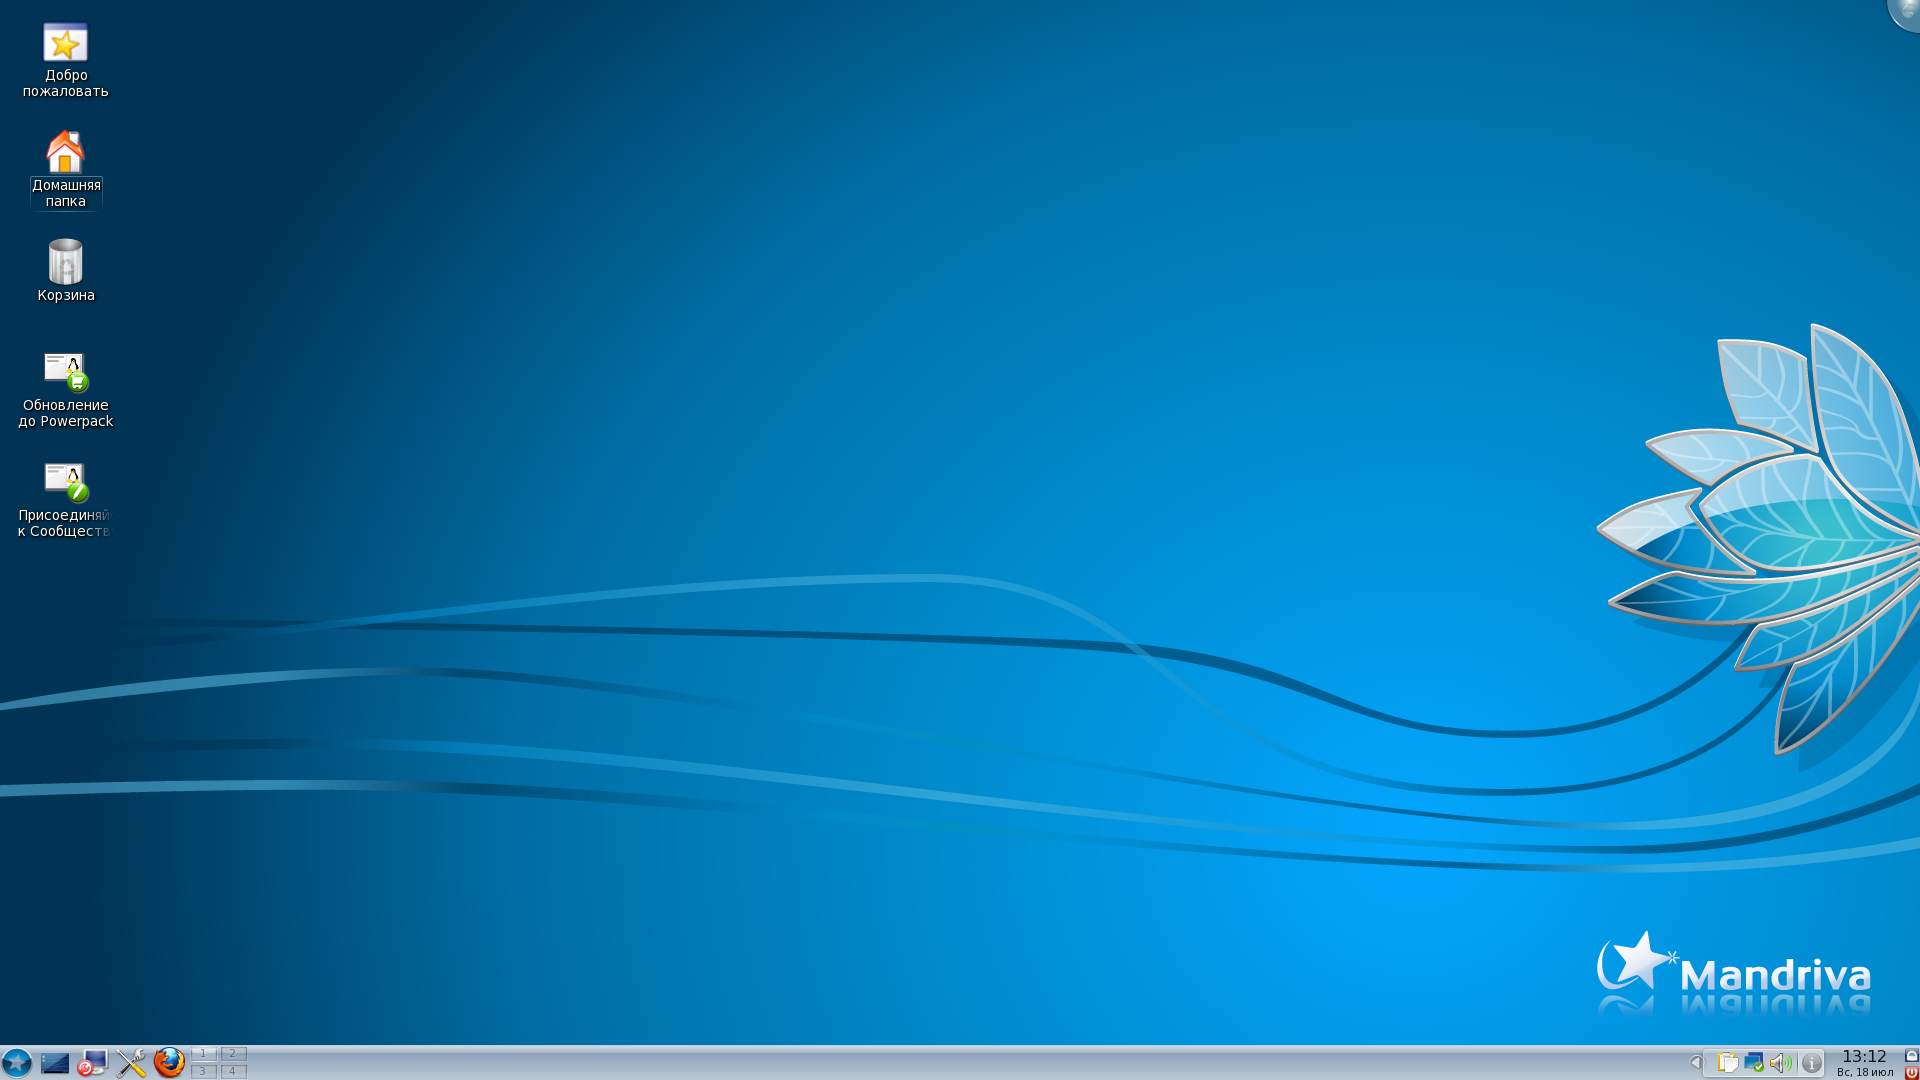 Mandriva Linux 2010.1 One с фирменным оформлением Ia Ora